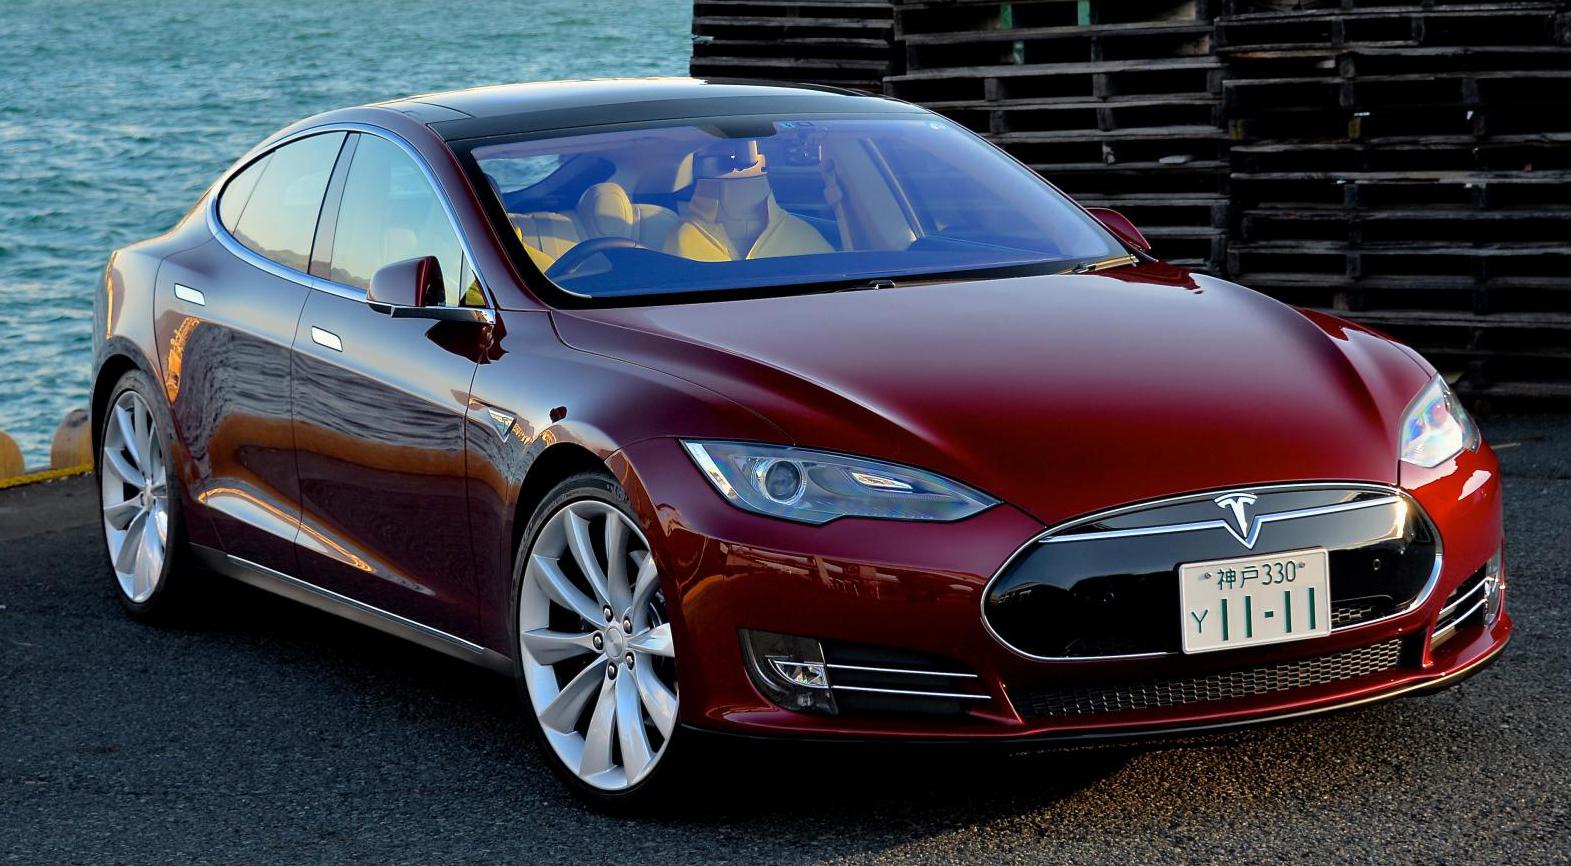 Tesla Announces Model S Upgrades Including Ludicrous Mode